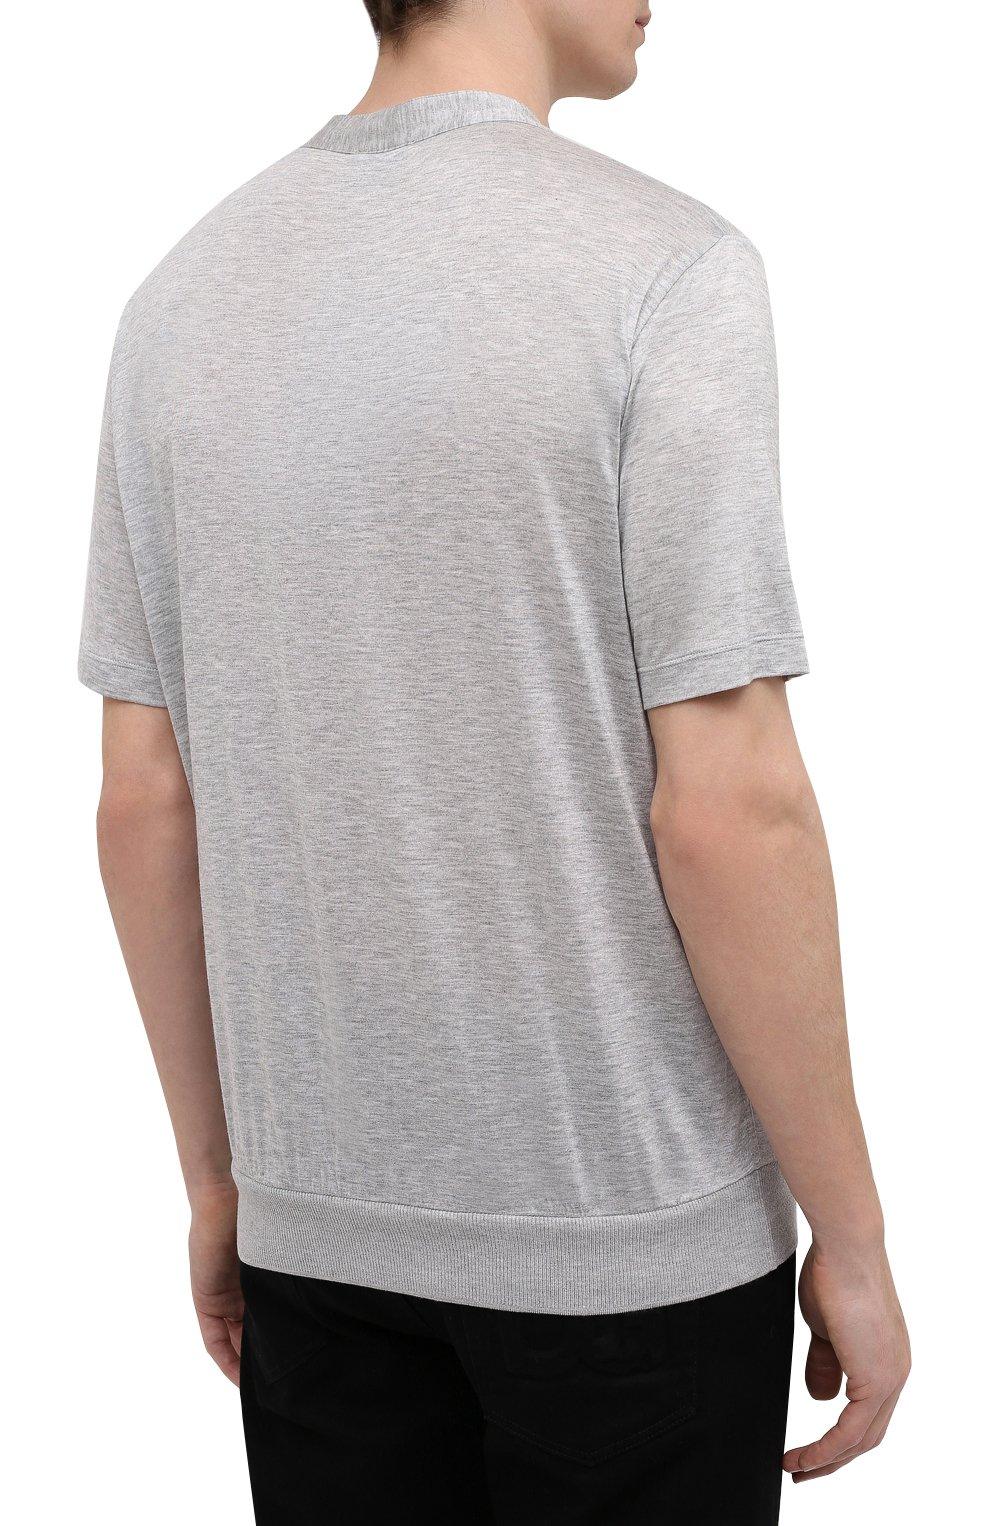 Мужская футболка из вискозы GIORGIO ARMANI серого цвета, арт. 3KSF50/SJYBZ | Фото 4